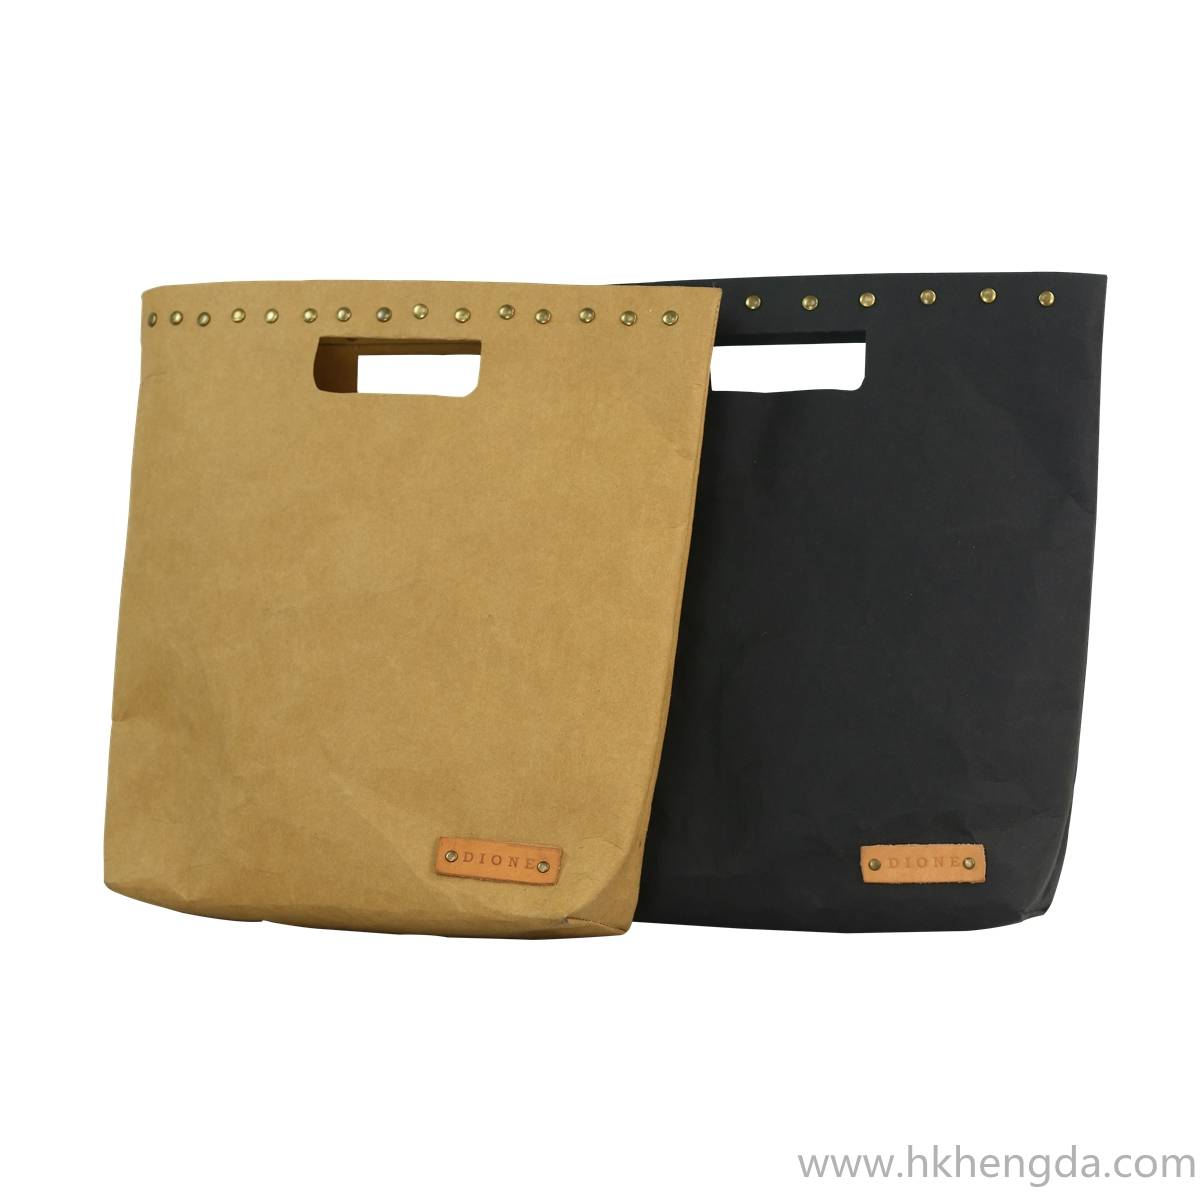 Handmade Eco-friendly washable kraft paper Tote bag